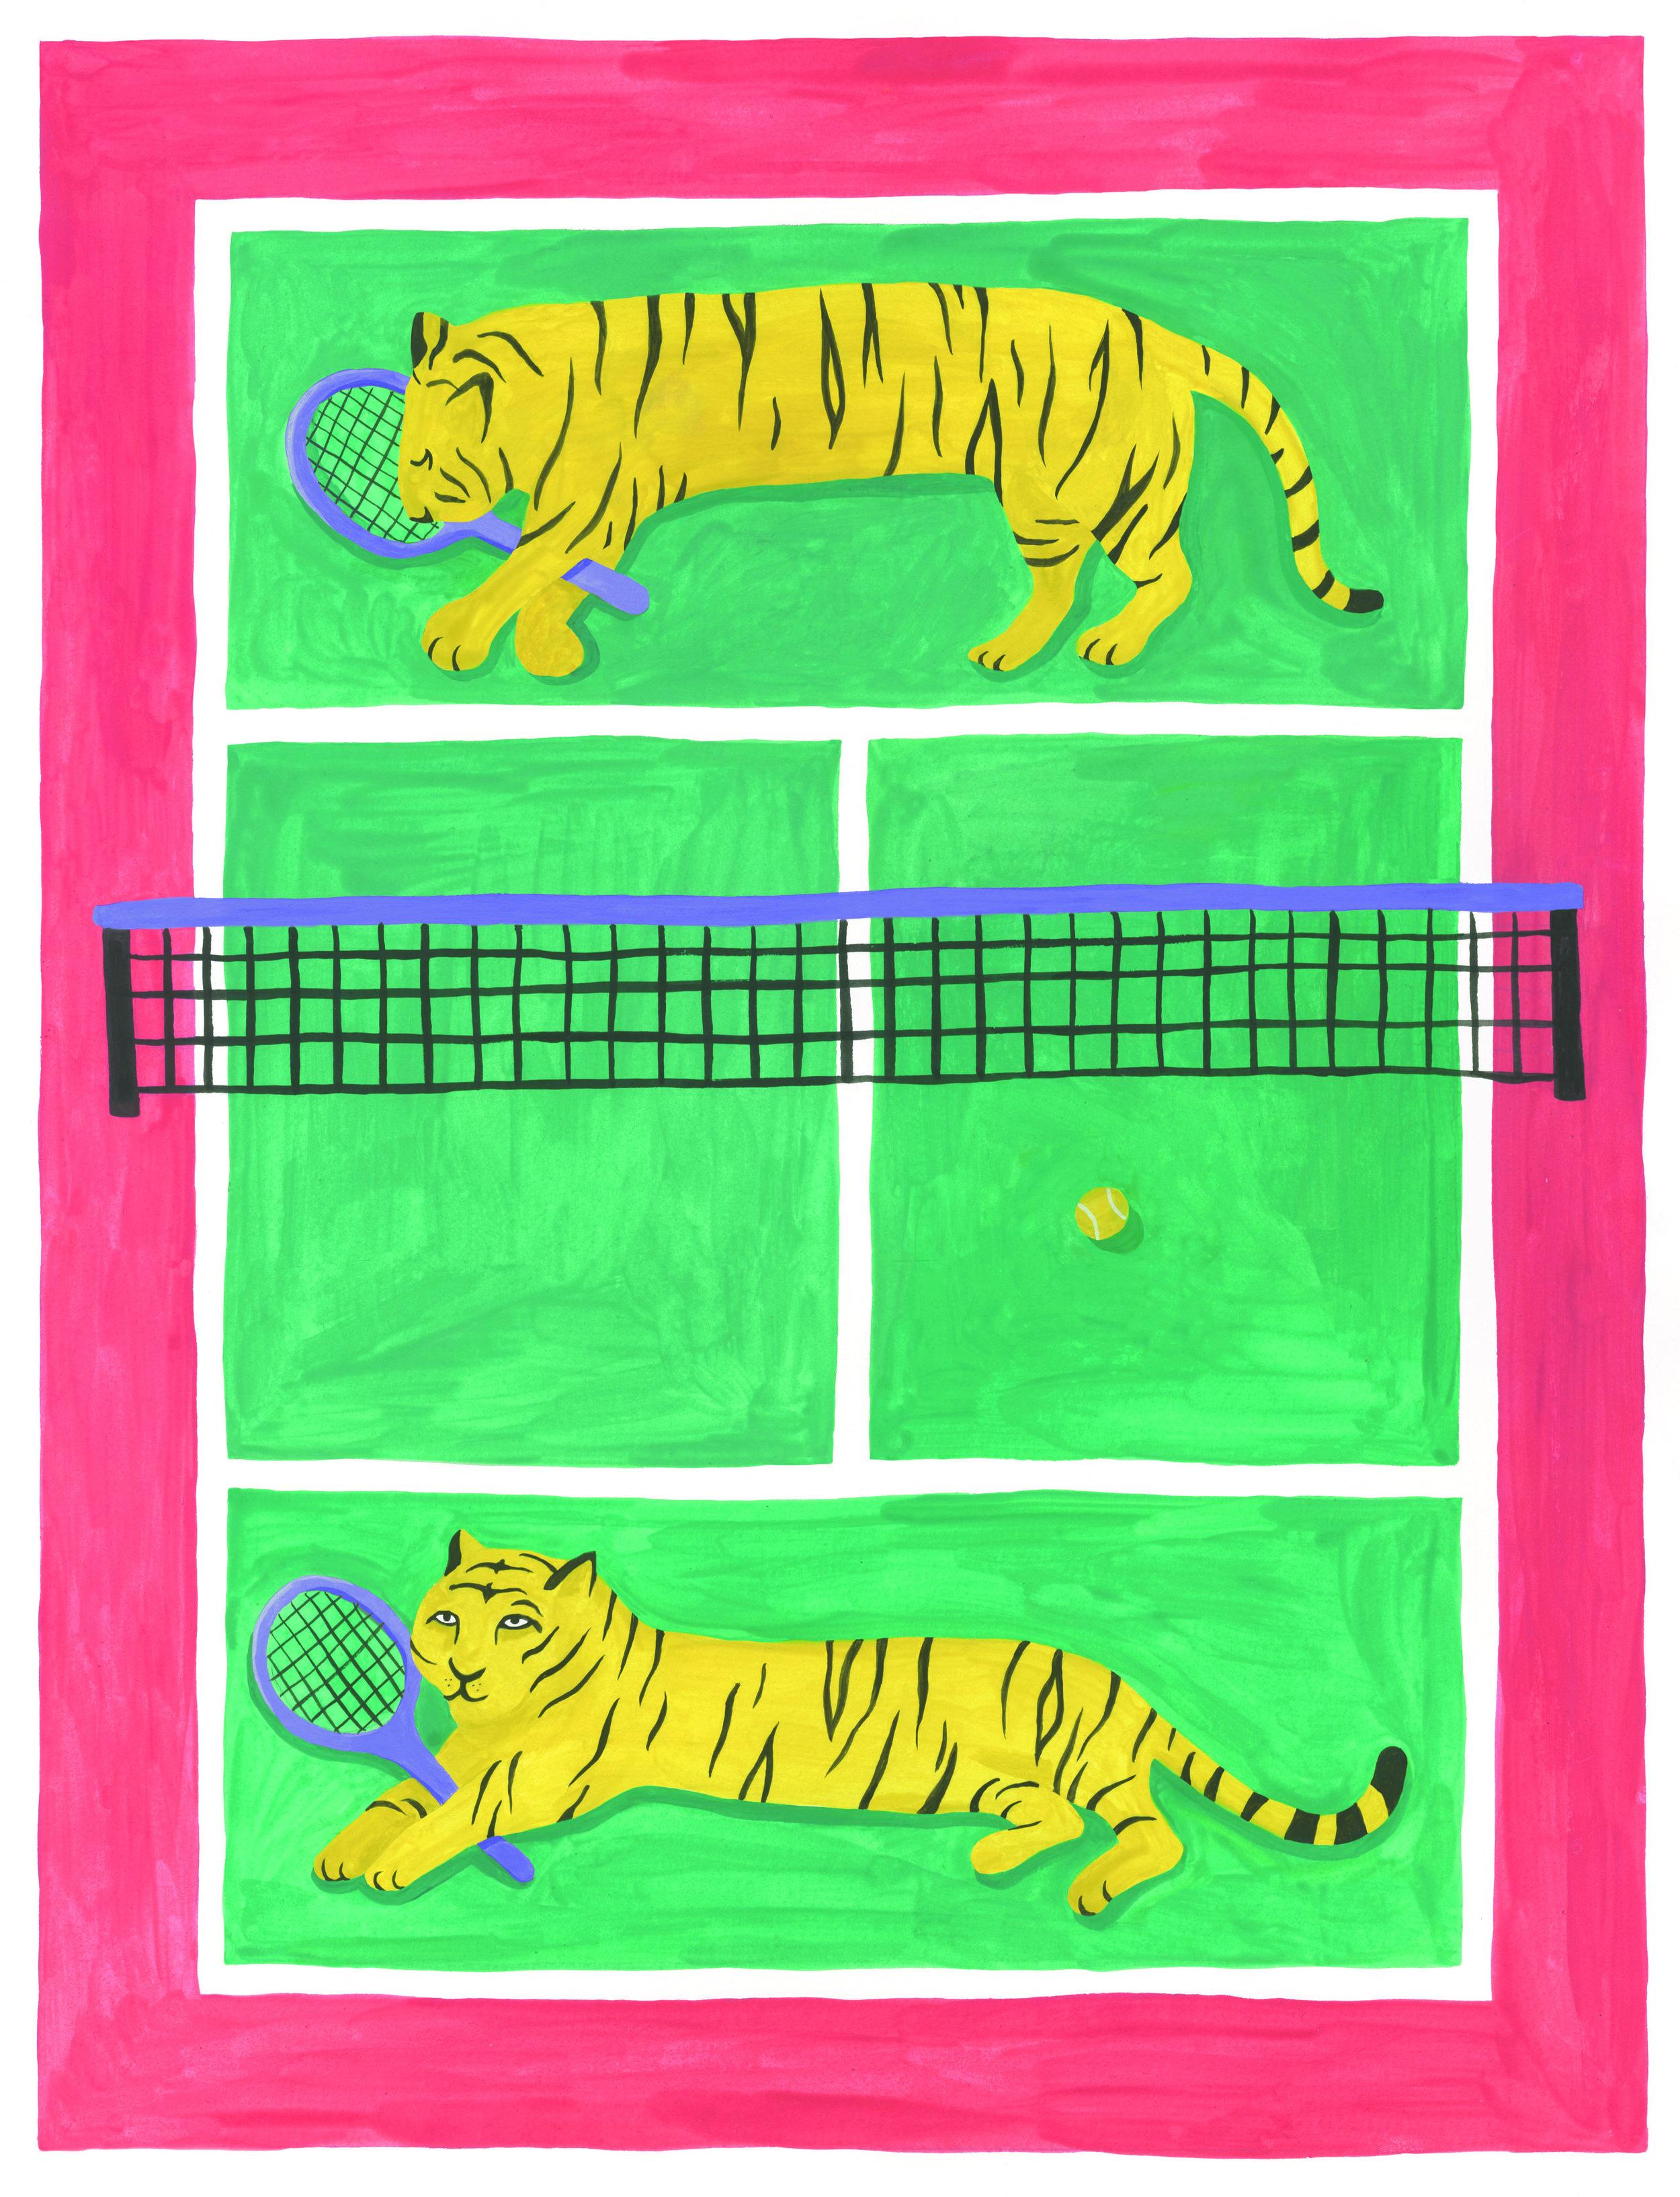 tennistijger_maaikecanne.jpg